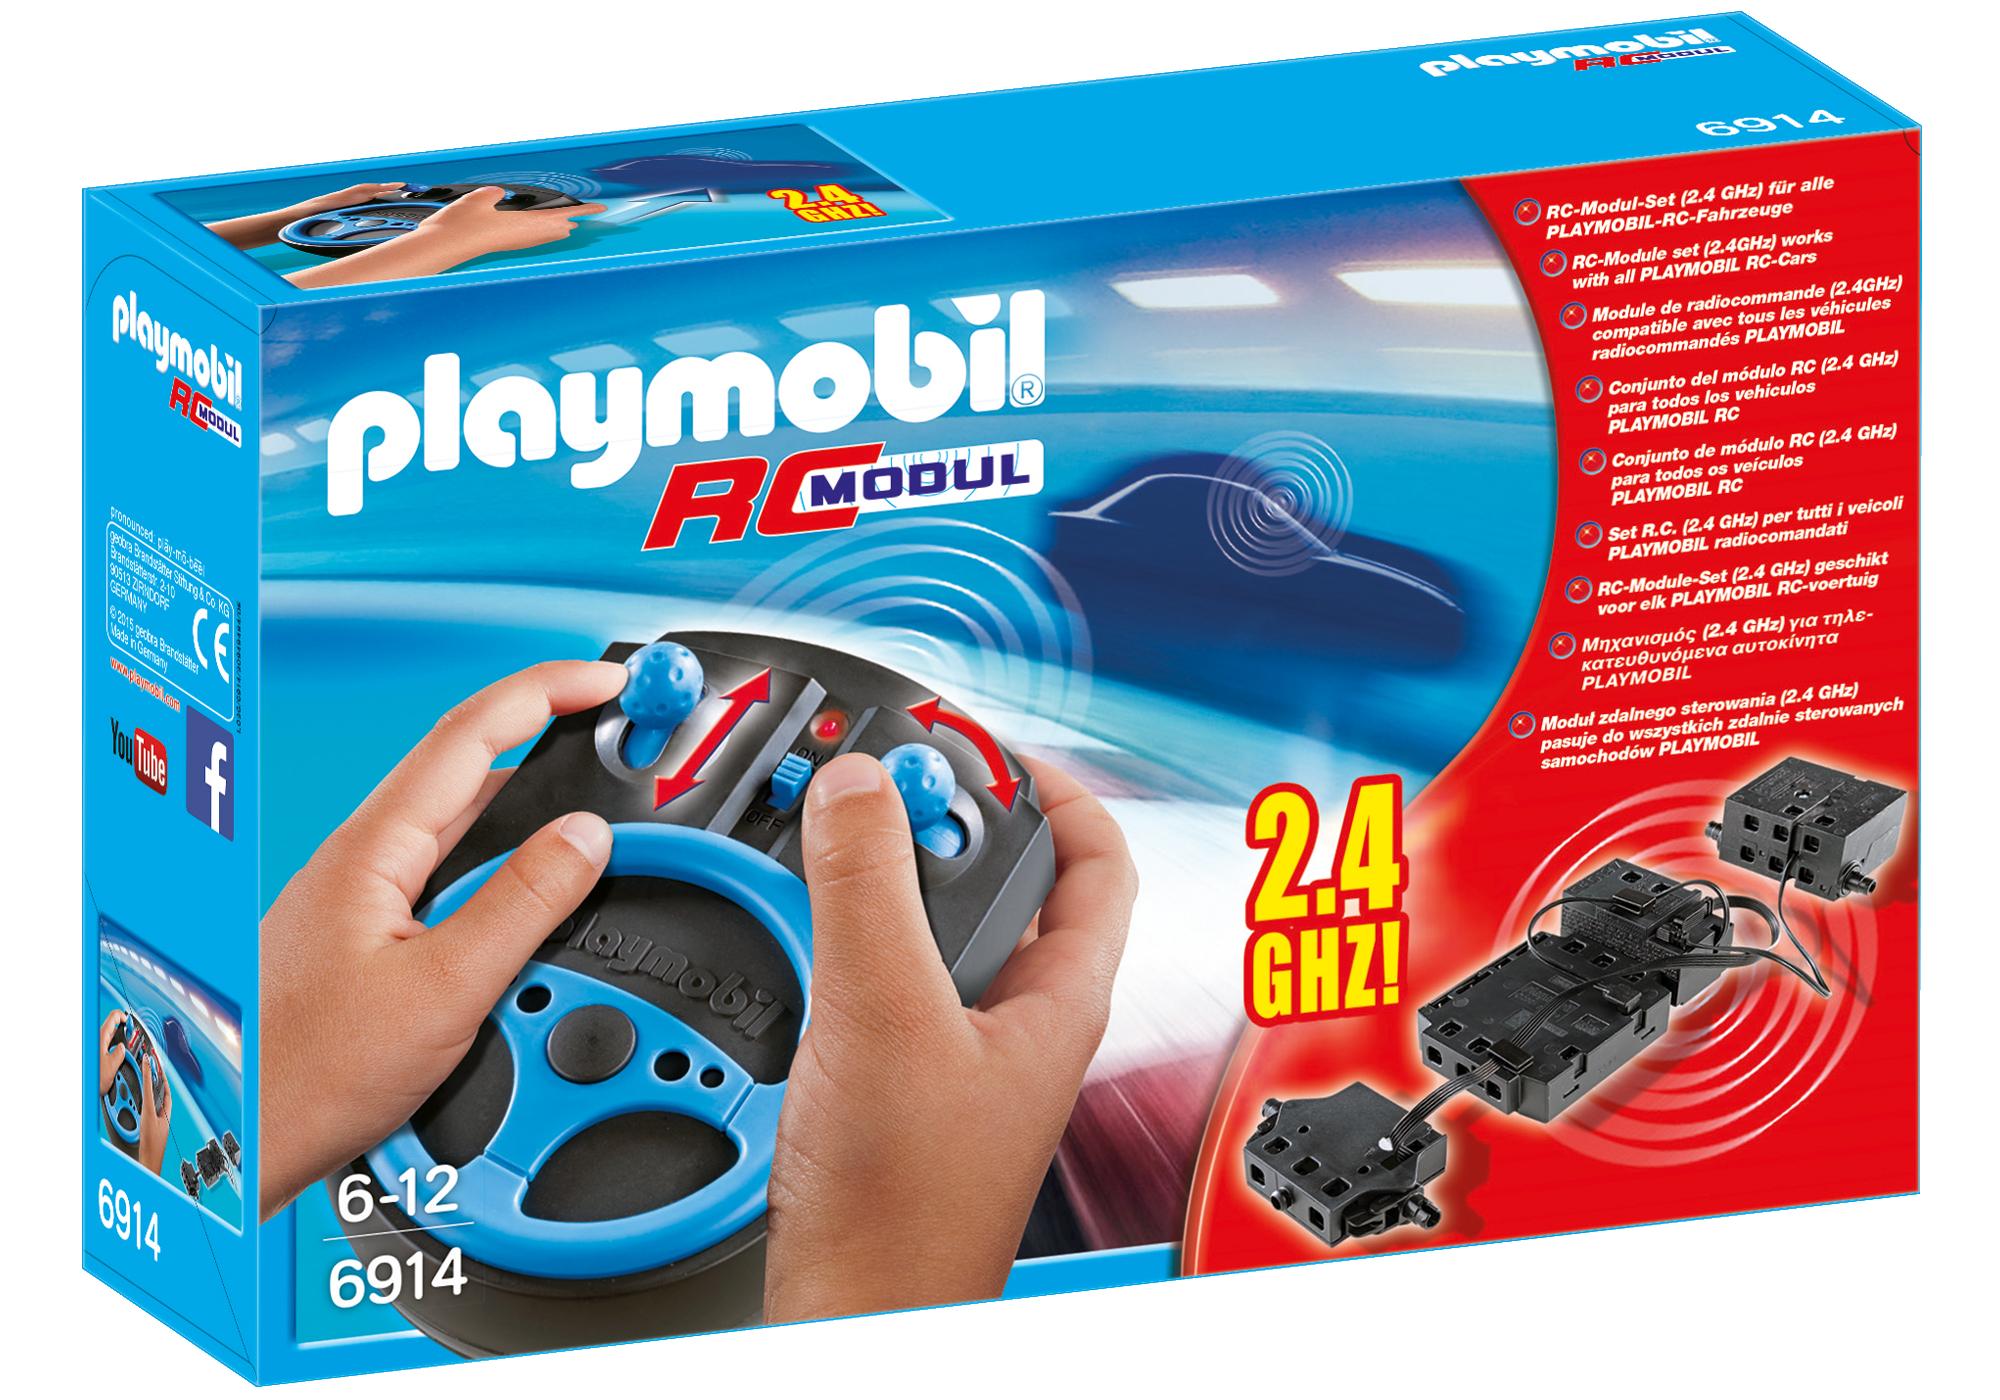 http://media.playmobil.com/i/playmobil/6914_product_box_front/Module de radiocommande 2,4 GHz